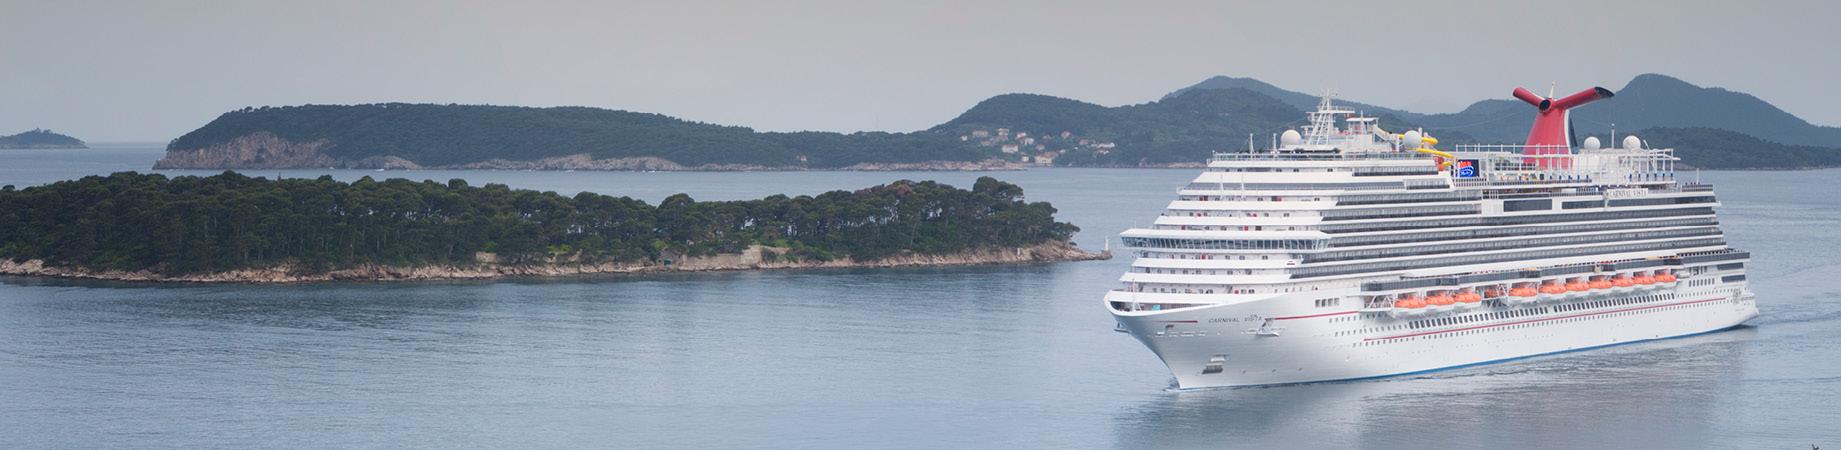 Cruise According To Cordelia